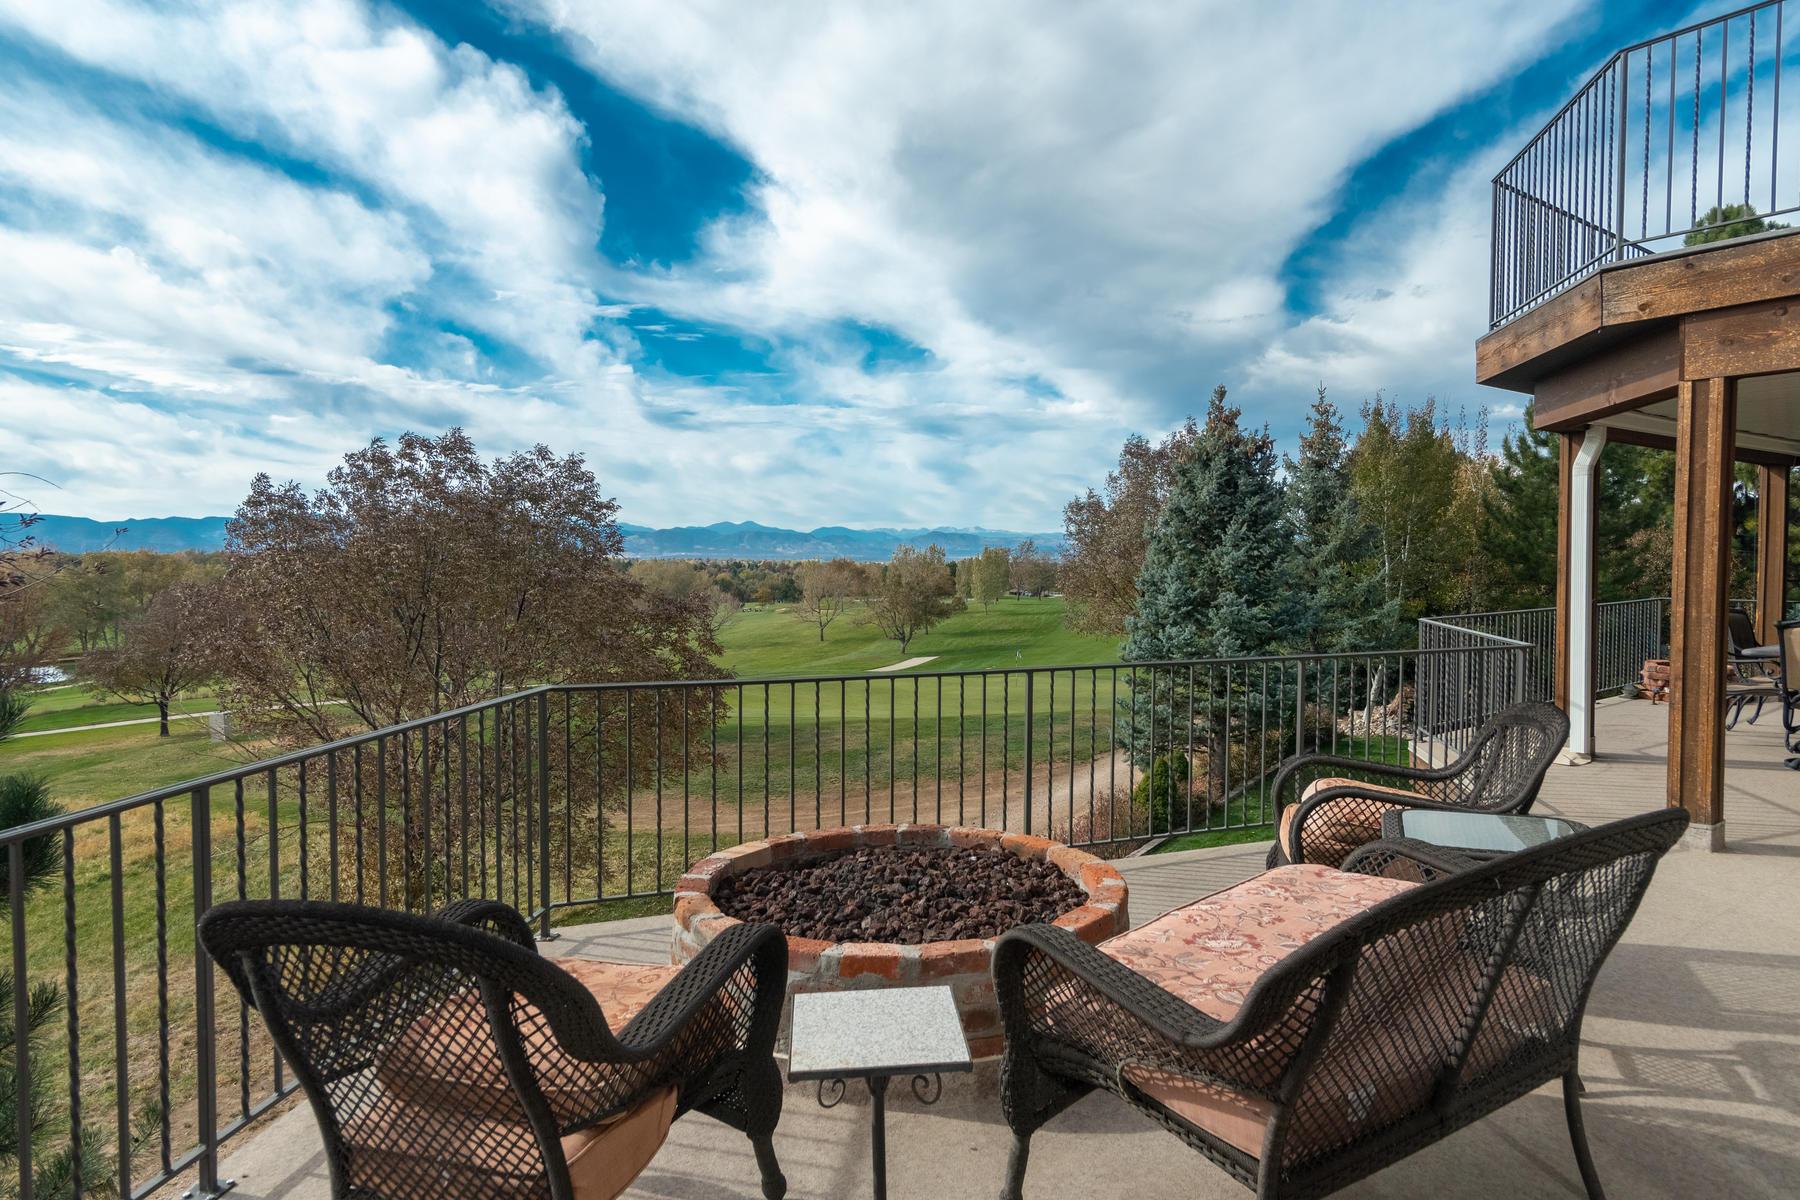 Single Family Homes for Sale at Views of South Suburban Golf Course! 7921 S Eudora Circle Centennial, Colorado 80122 United States